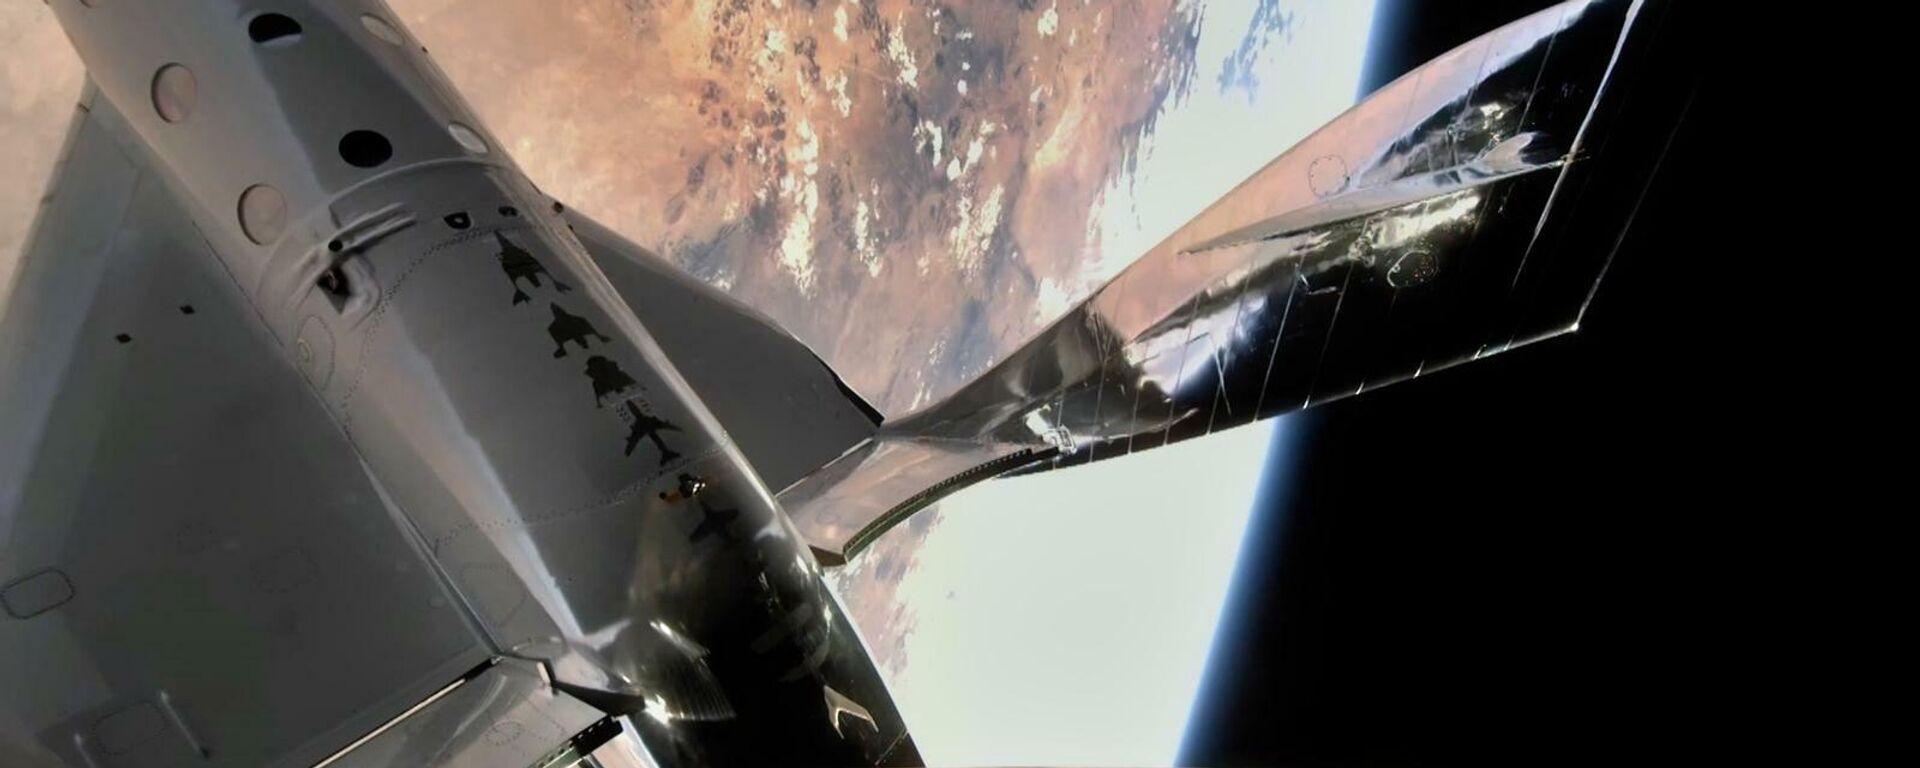 "Raumflugzeug ""VSS Unity"" im Weltall, der 22. Mai 2021 - SNA, 1920, 25.06.2021"